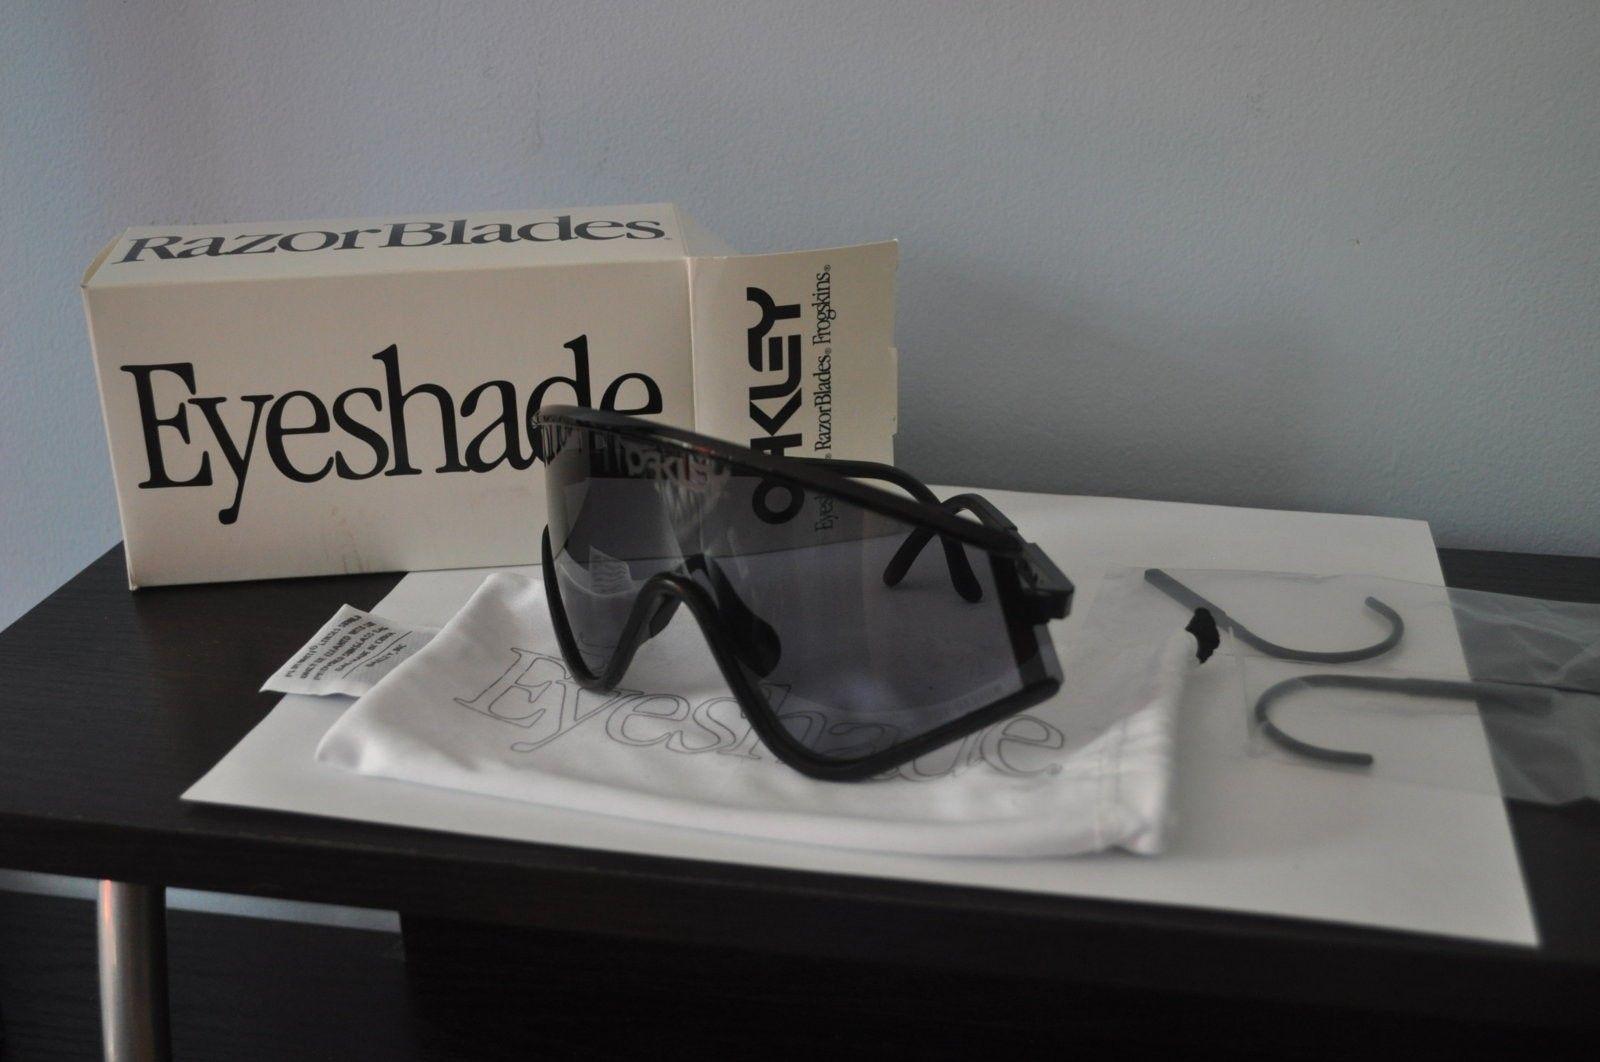 Disruptive by Design Eyeshade, 2010 Eyeshade (neon yellow), Vintage and 30th eyeshade - DSC_0094.JPG